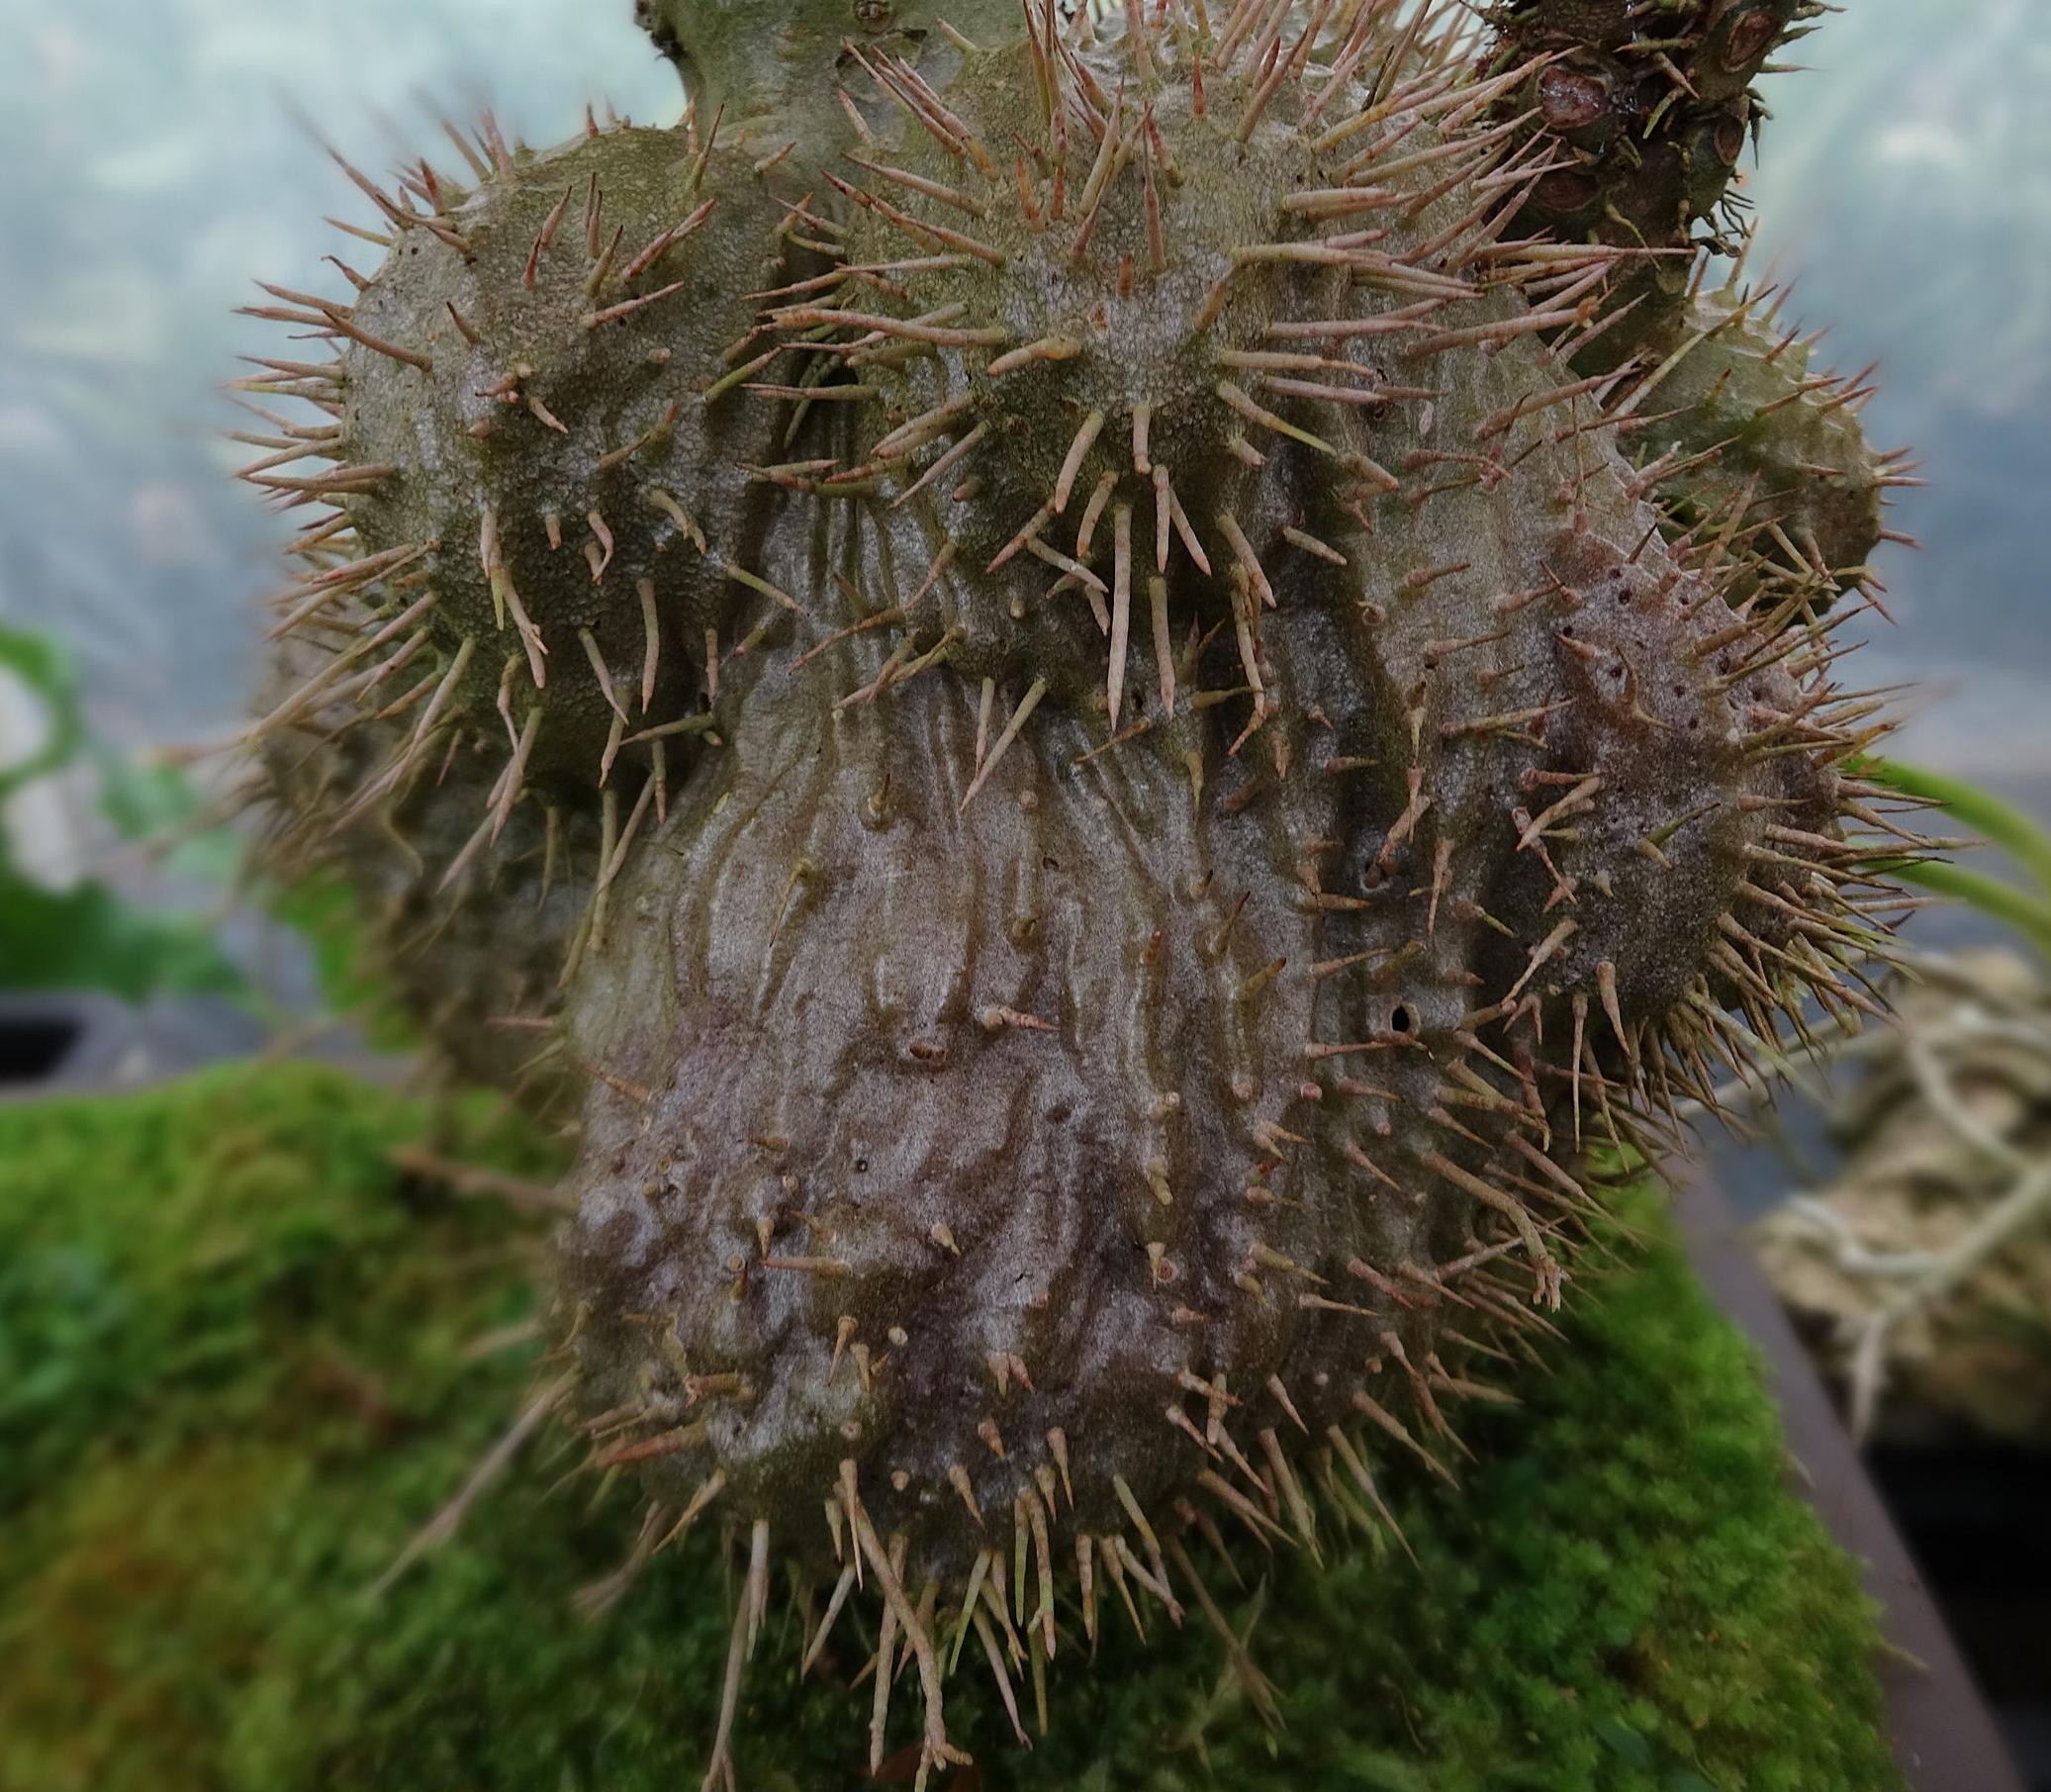 Caudex detail, young mature  Myrmecodia tuberosa sibuyanensis  from Luzon island, Philippines.